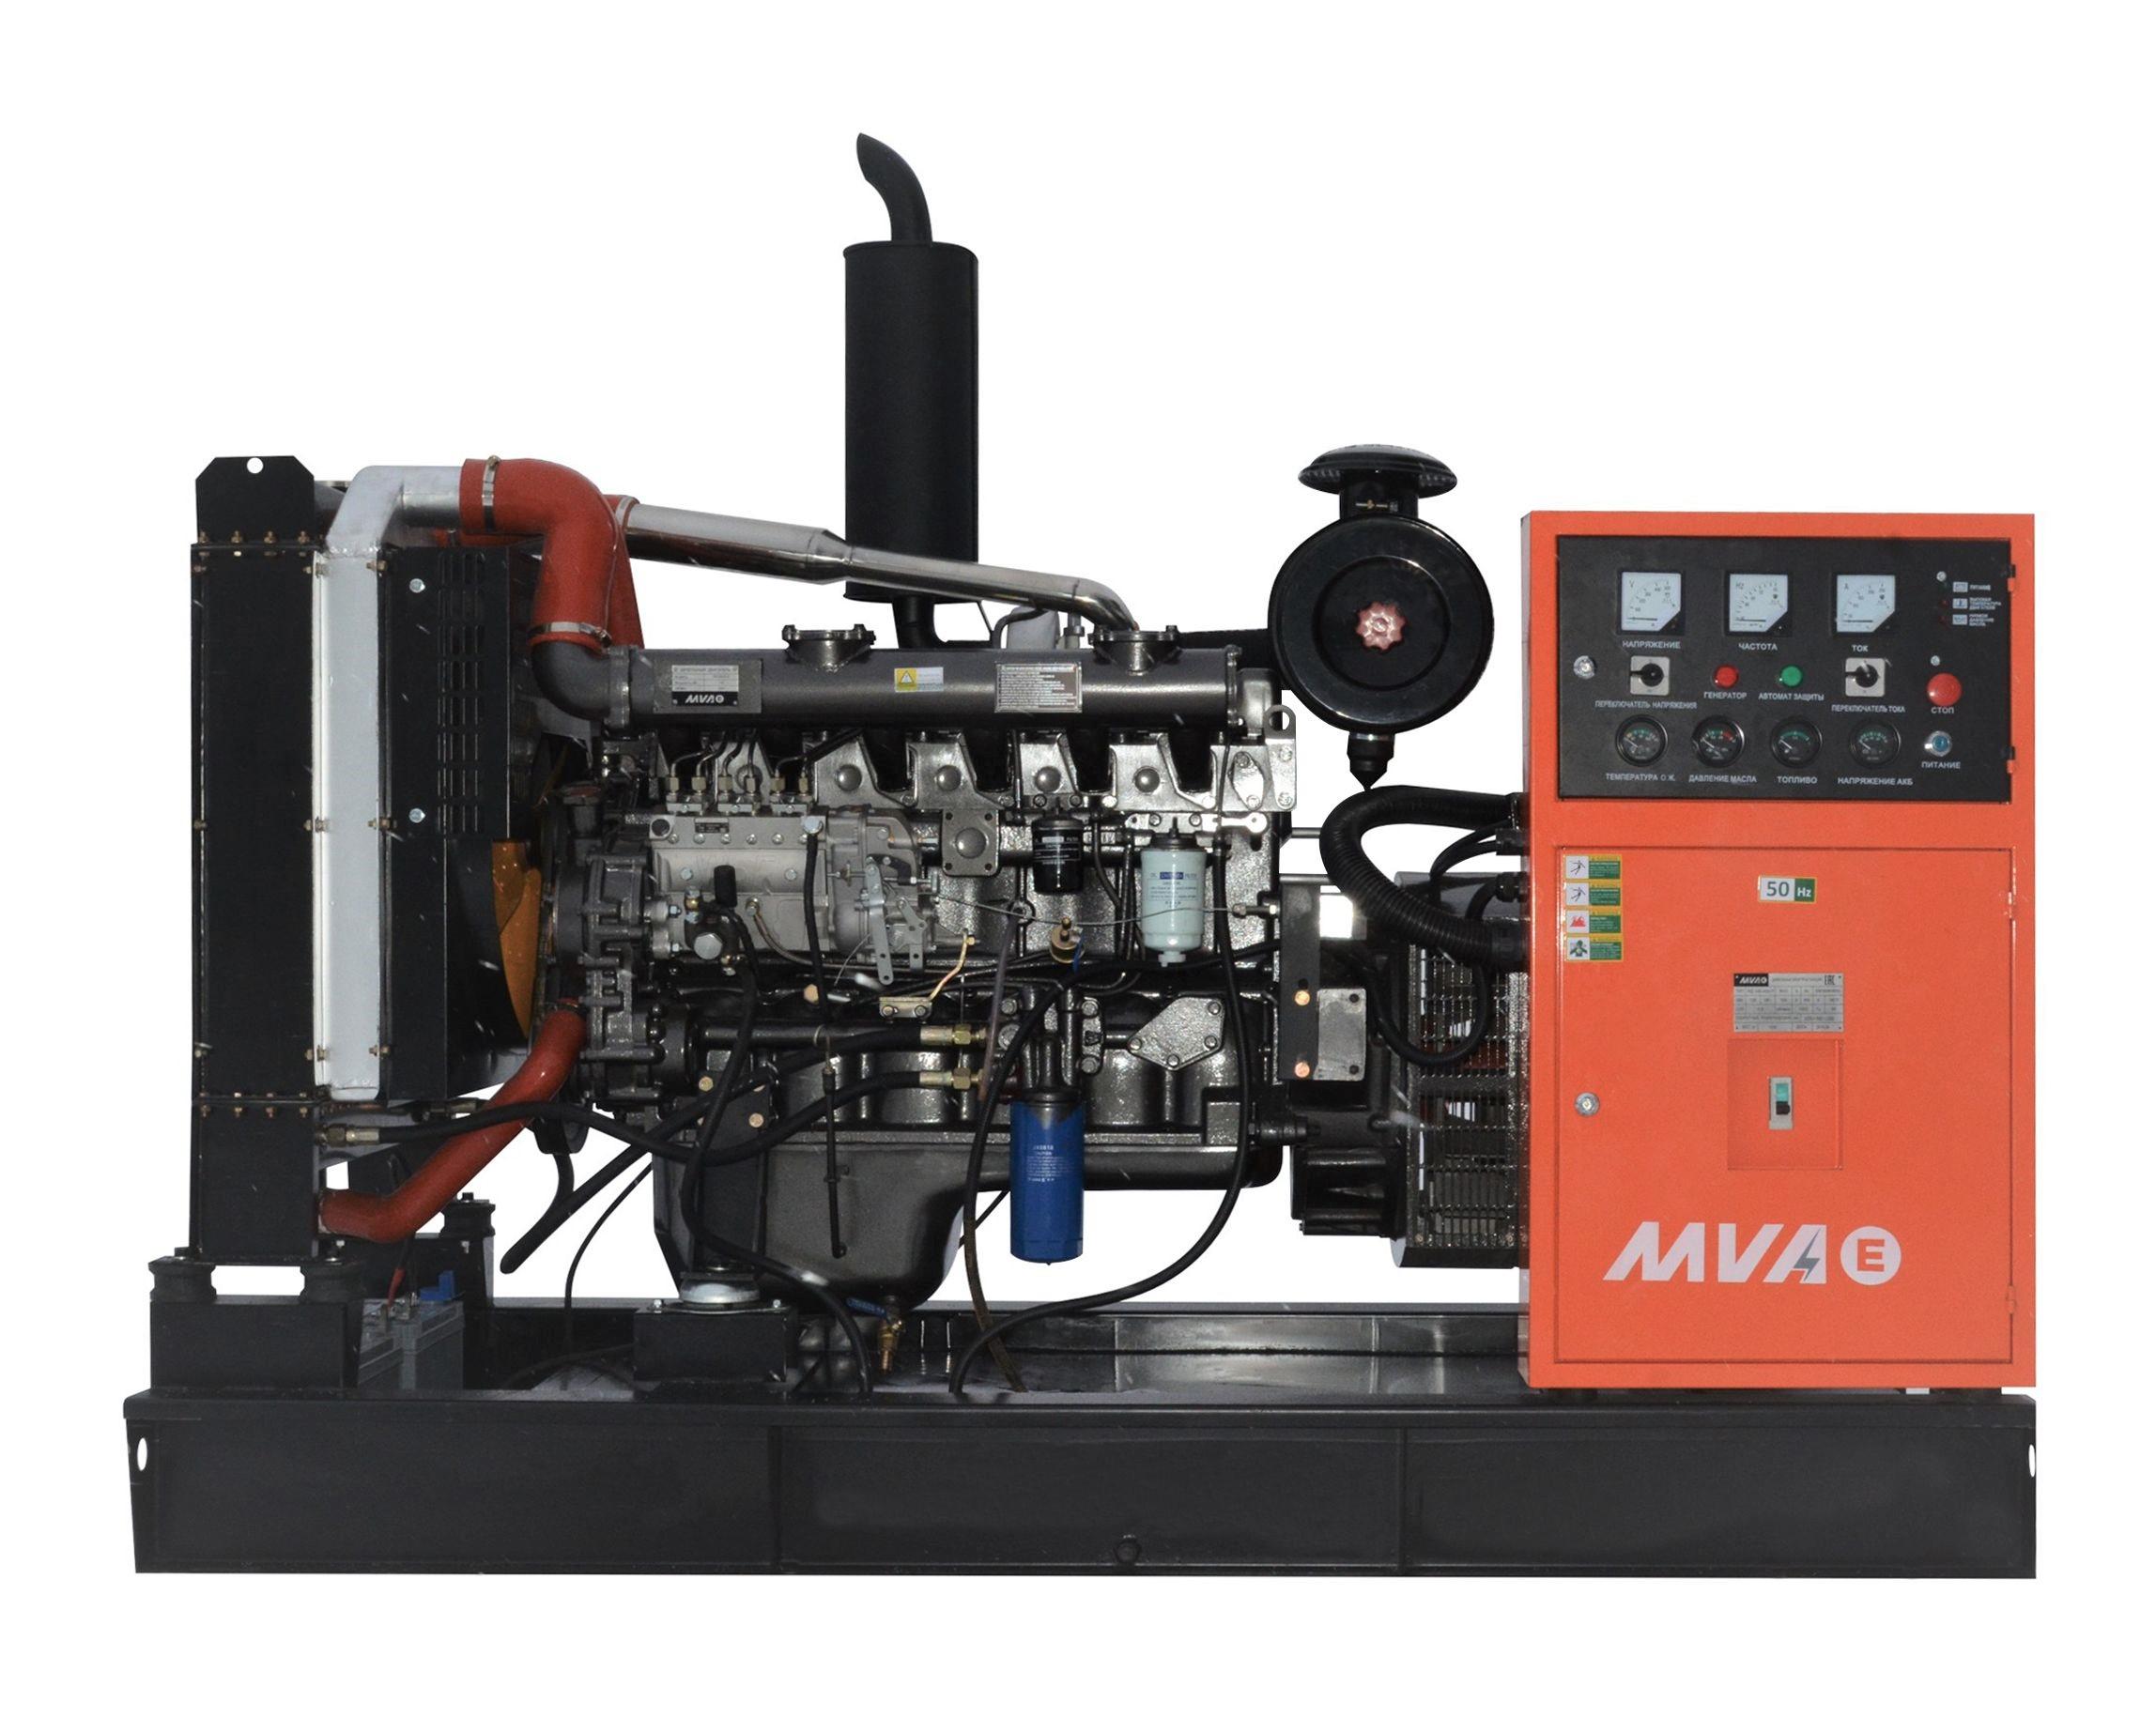 Внешний вид MVAE АД-100-400-Р на раме